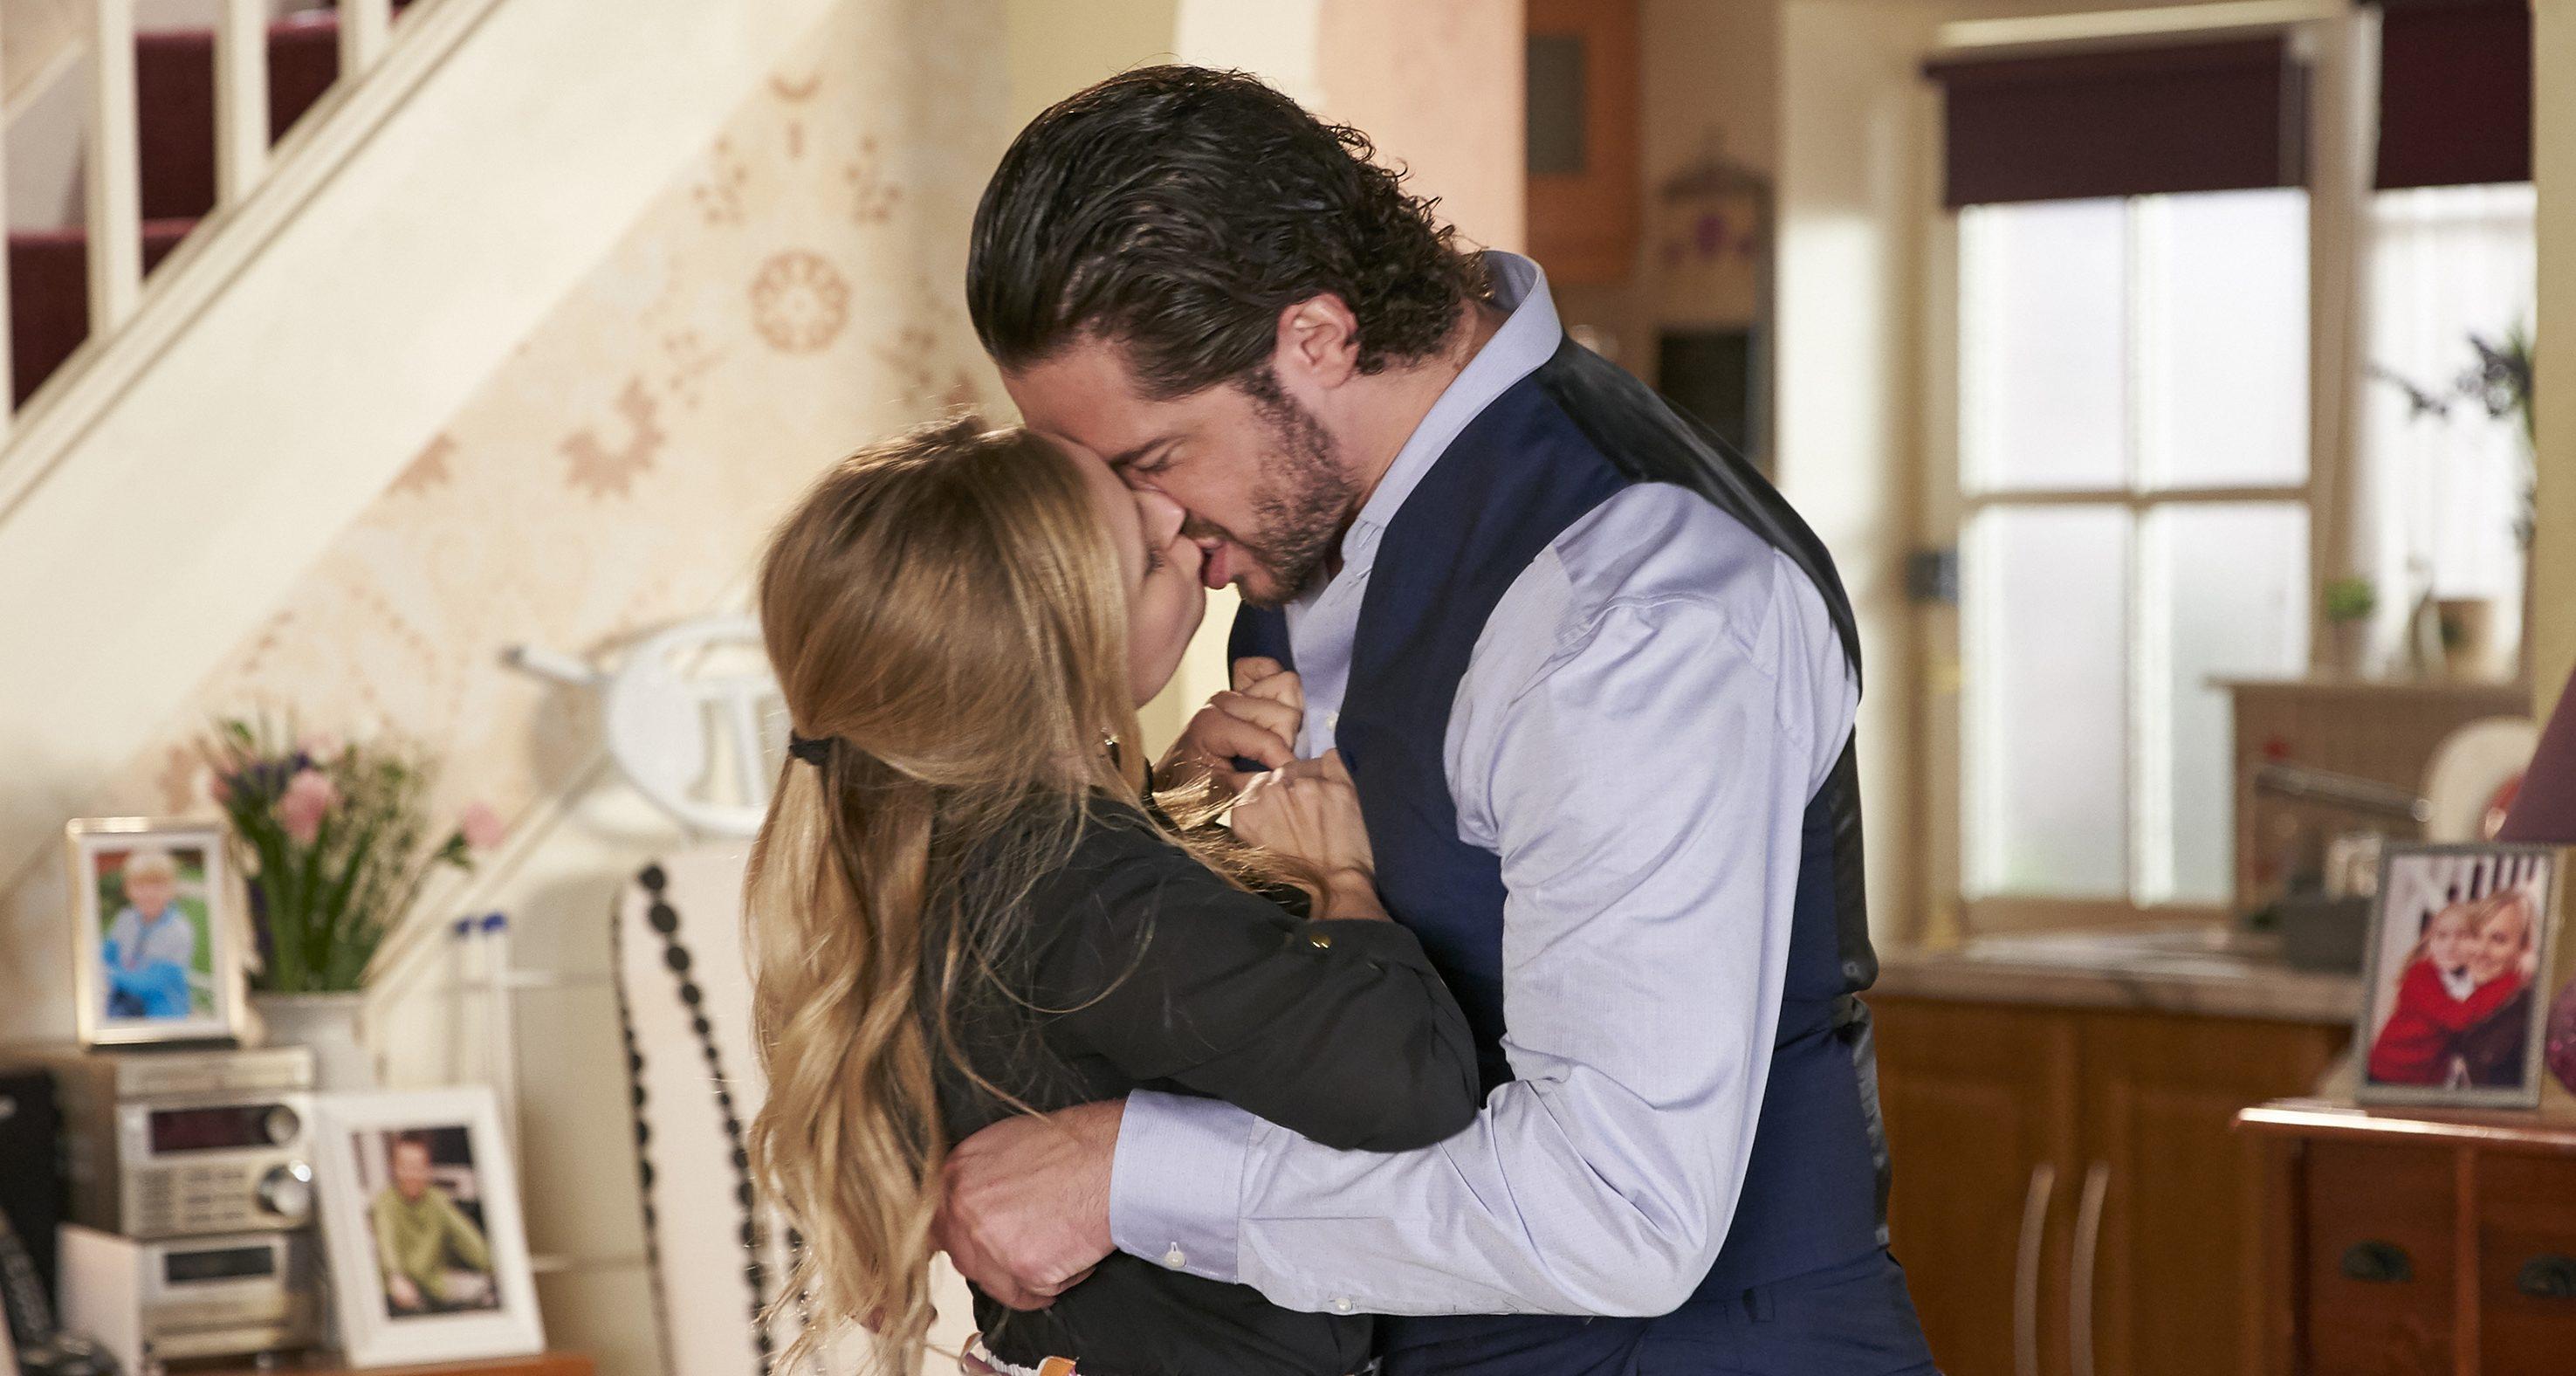 Coronation Street's Tina O'Brien on kissing scenes with Sam Robertson